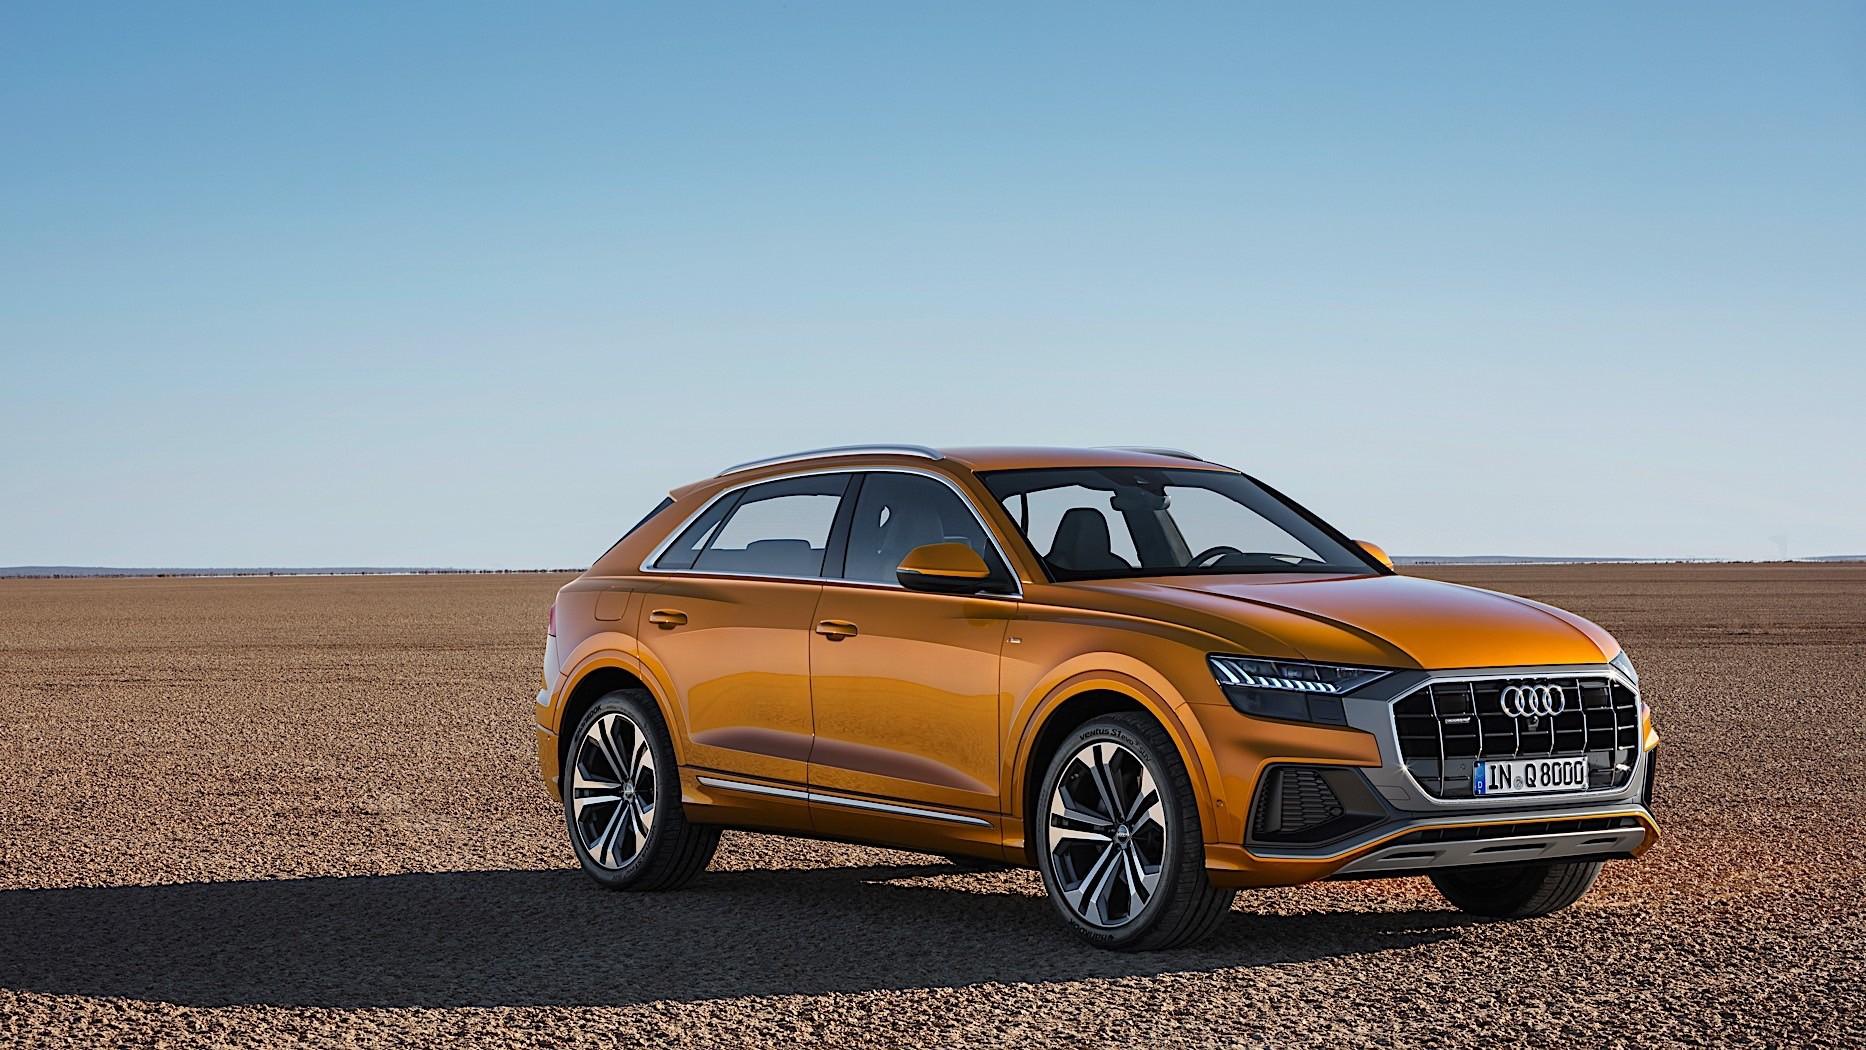 2020 Audi Q4 Spied, Camouflage Hides Q8 Design Influences ...